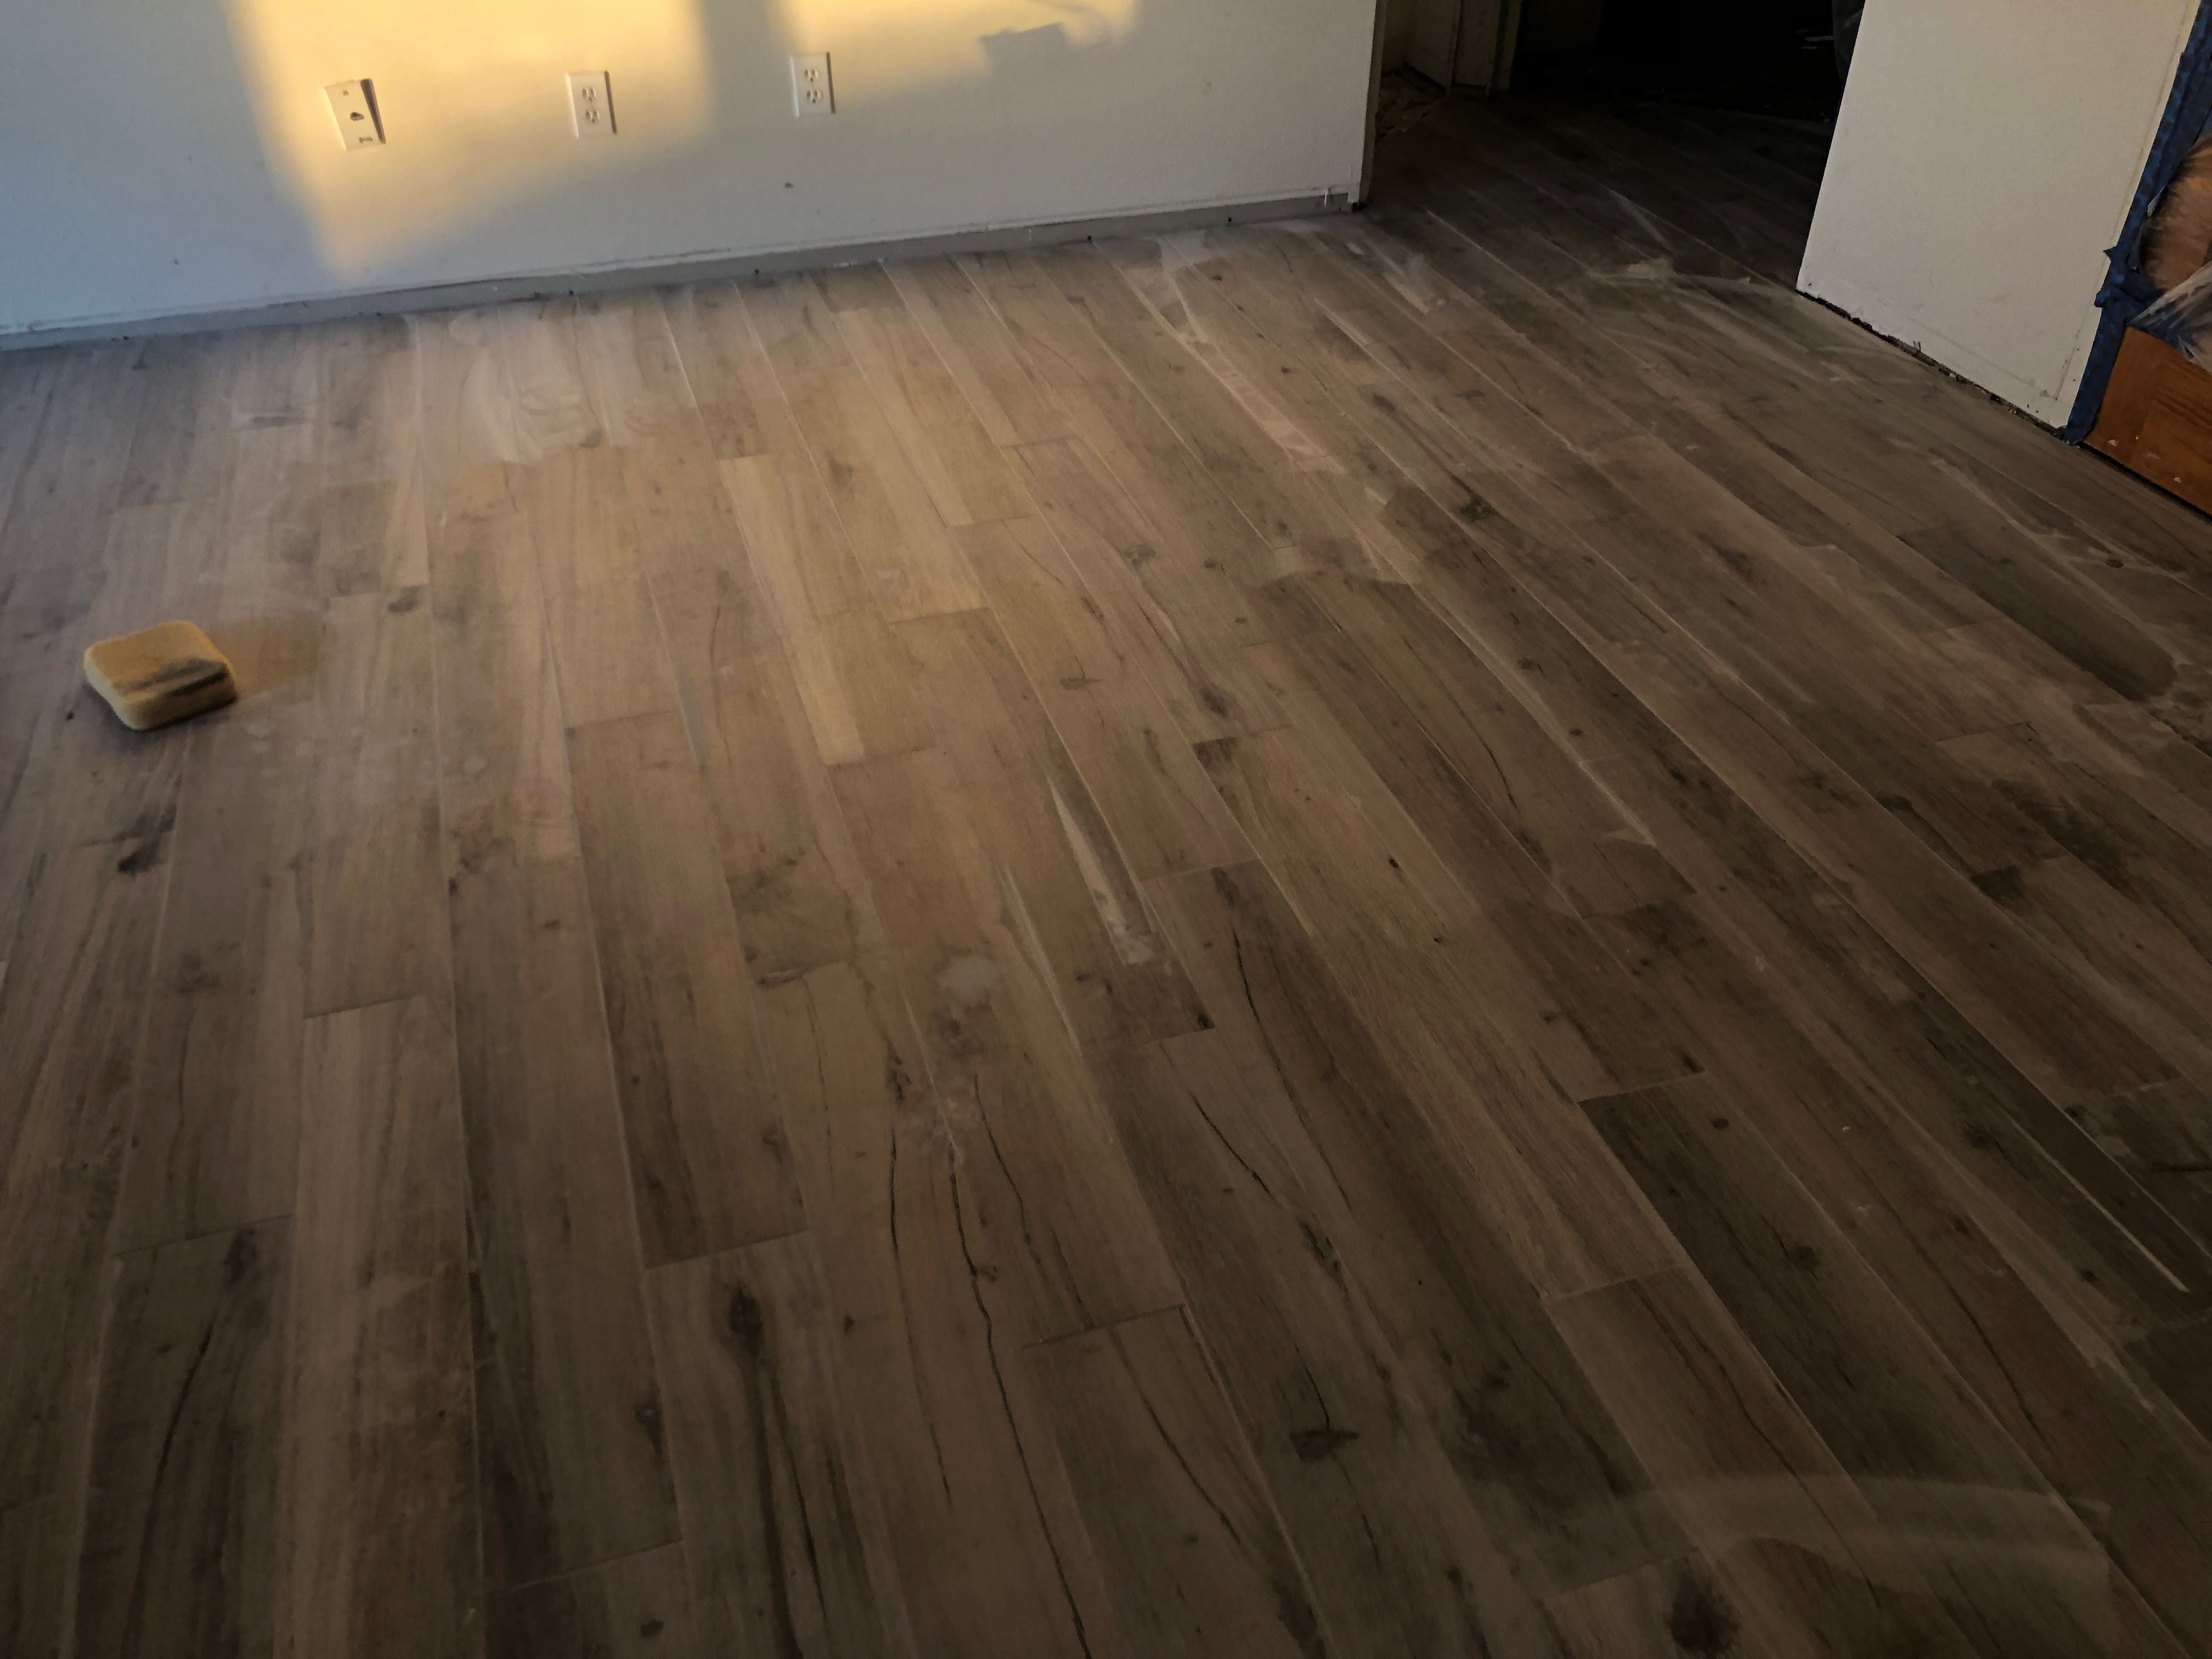 Pin By Stephanie Hertzog On Lake Selections Hardwood Floors Hardwood Flooring